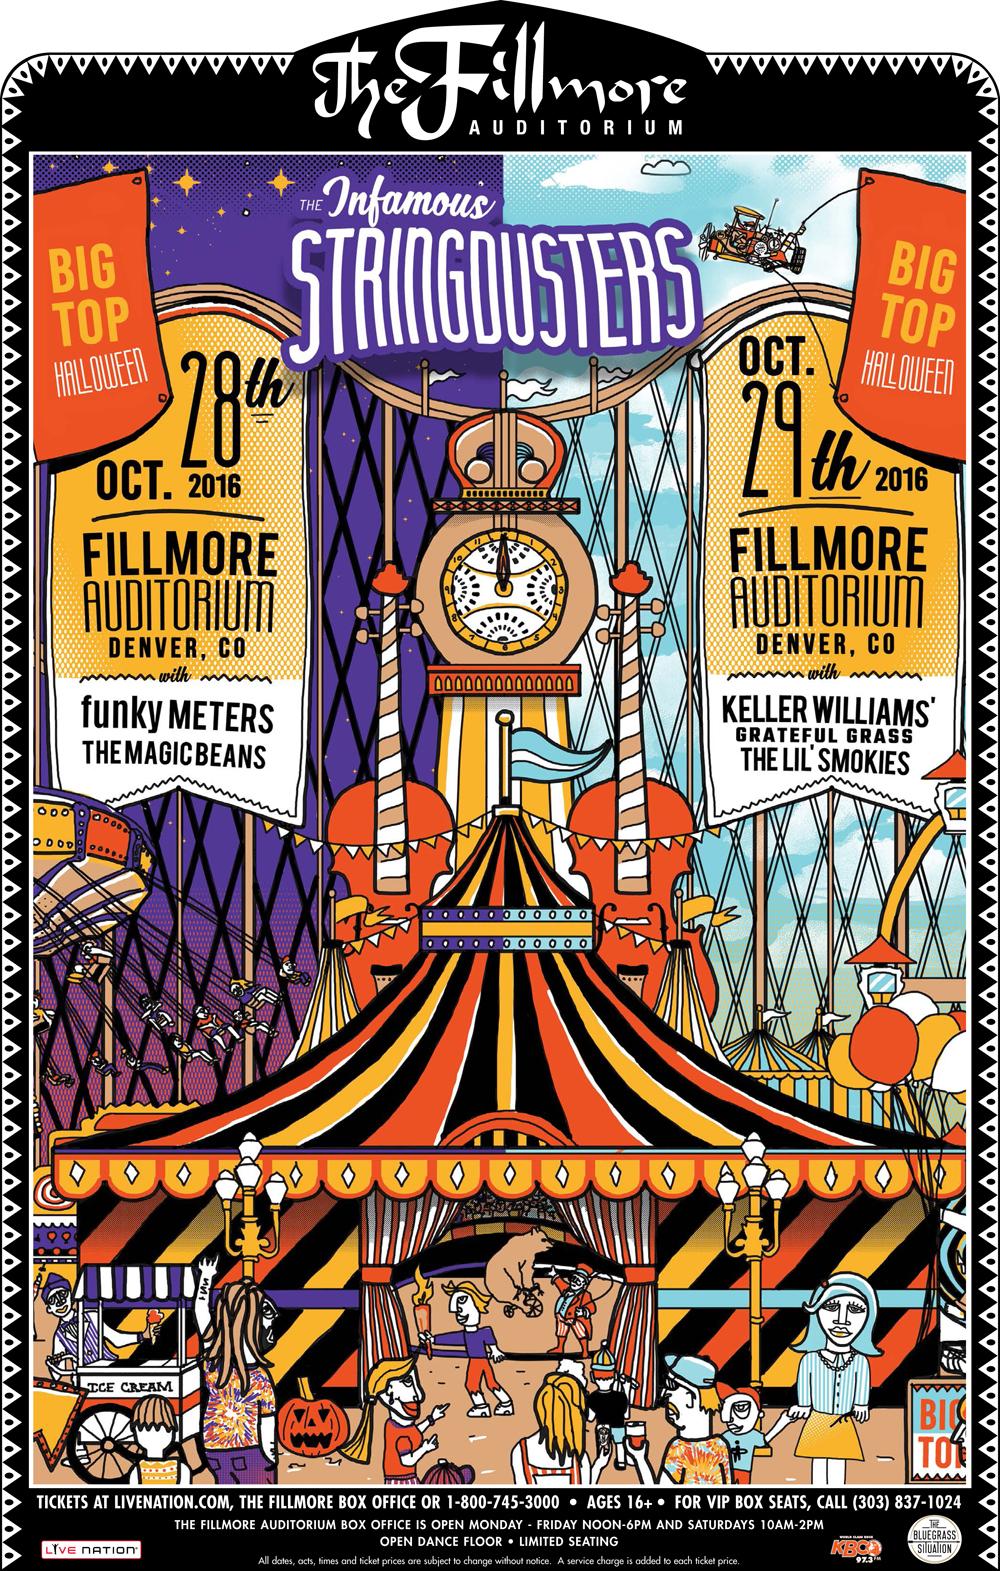 BGS Presents the Infamous Stringdusters' Big Top Halloween (BONUS: Video Premiere)